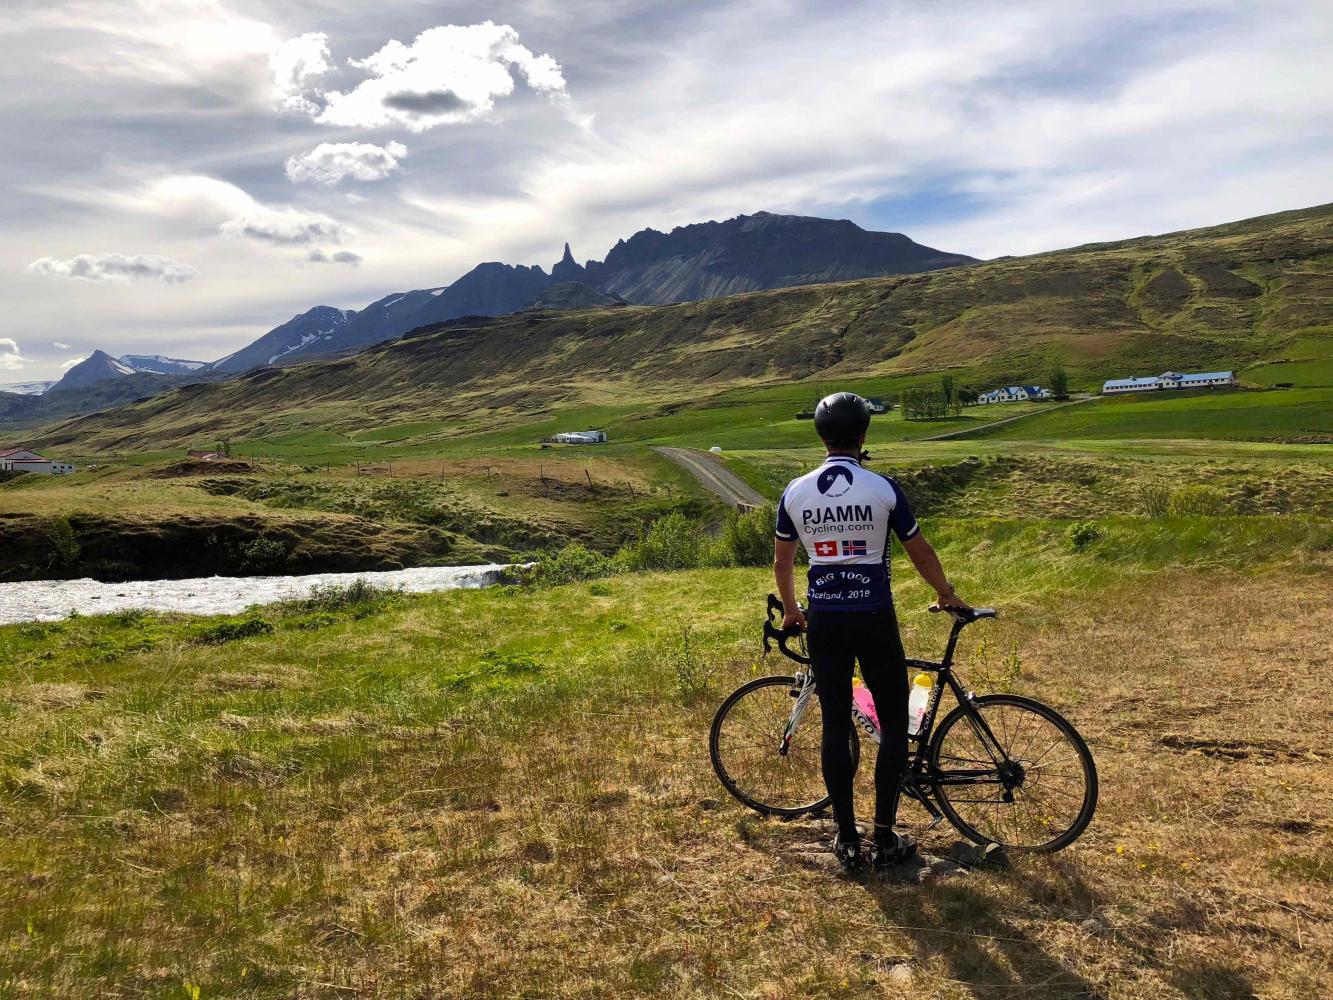 Oxnadalsheioi East Bike Climb - PJAMM Cycling